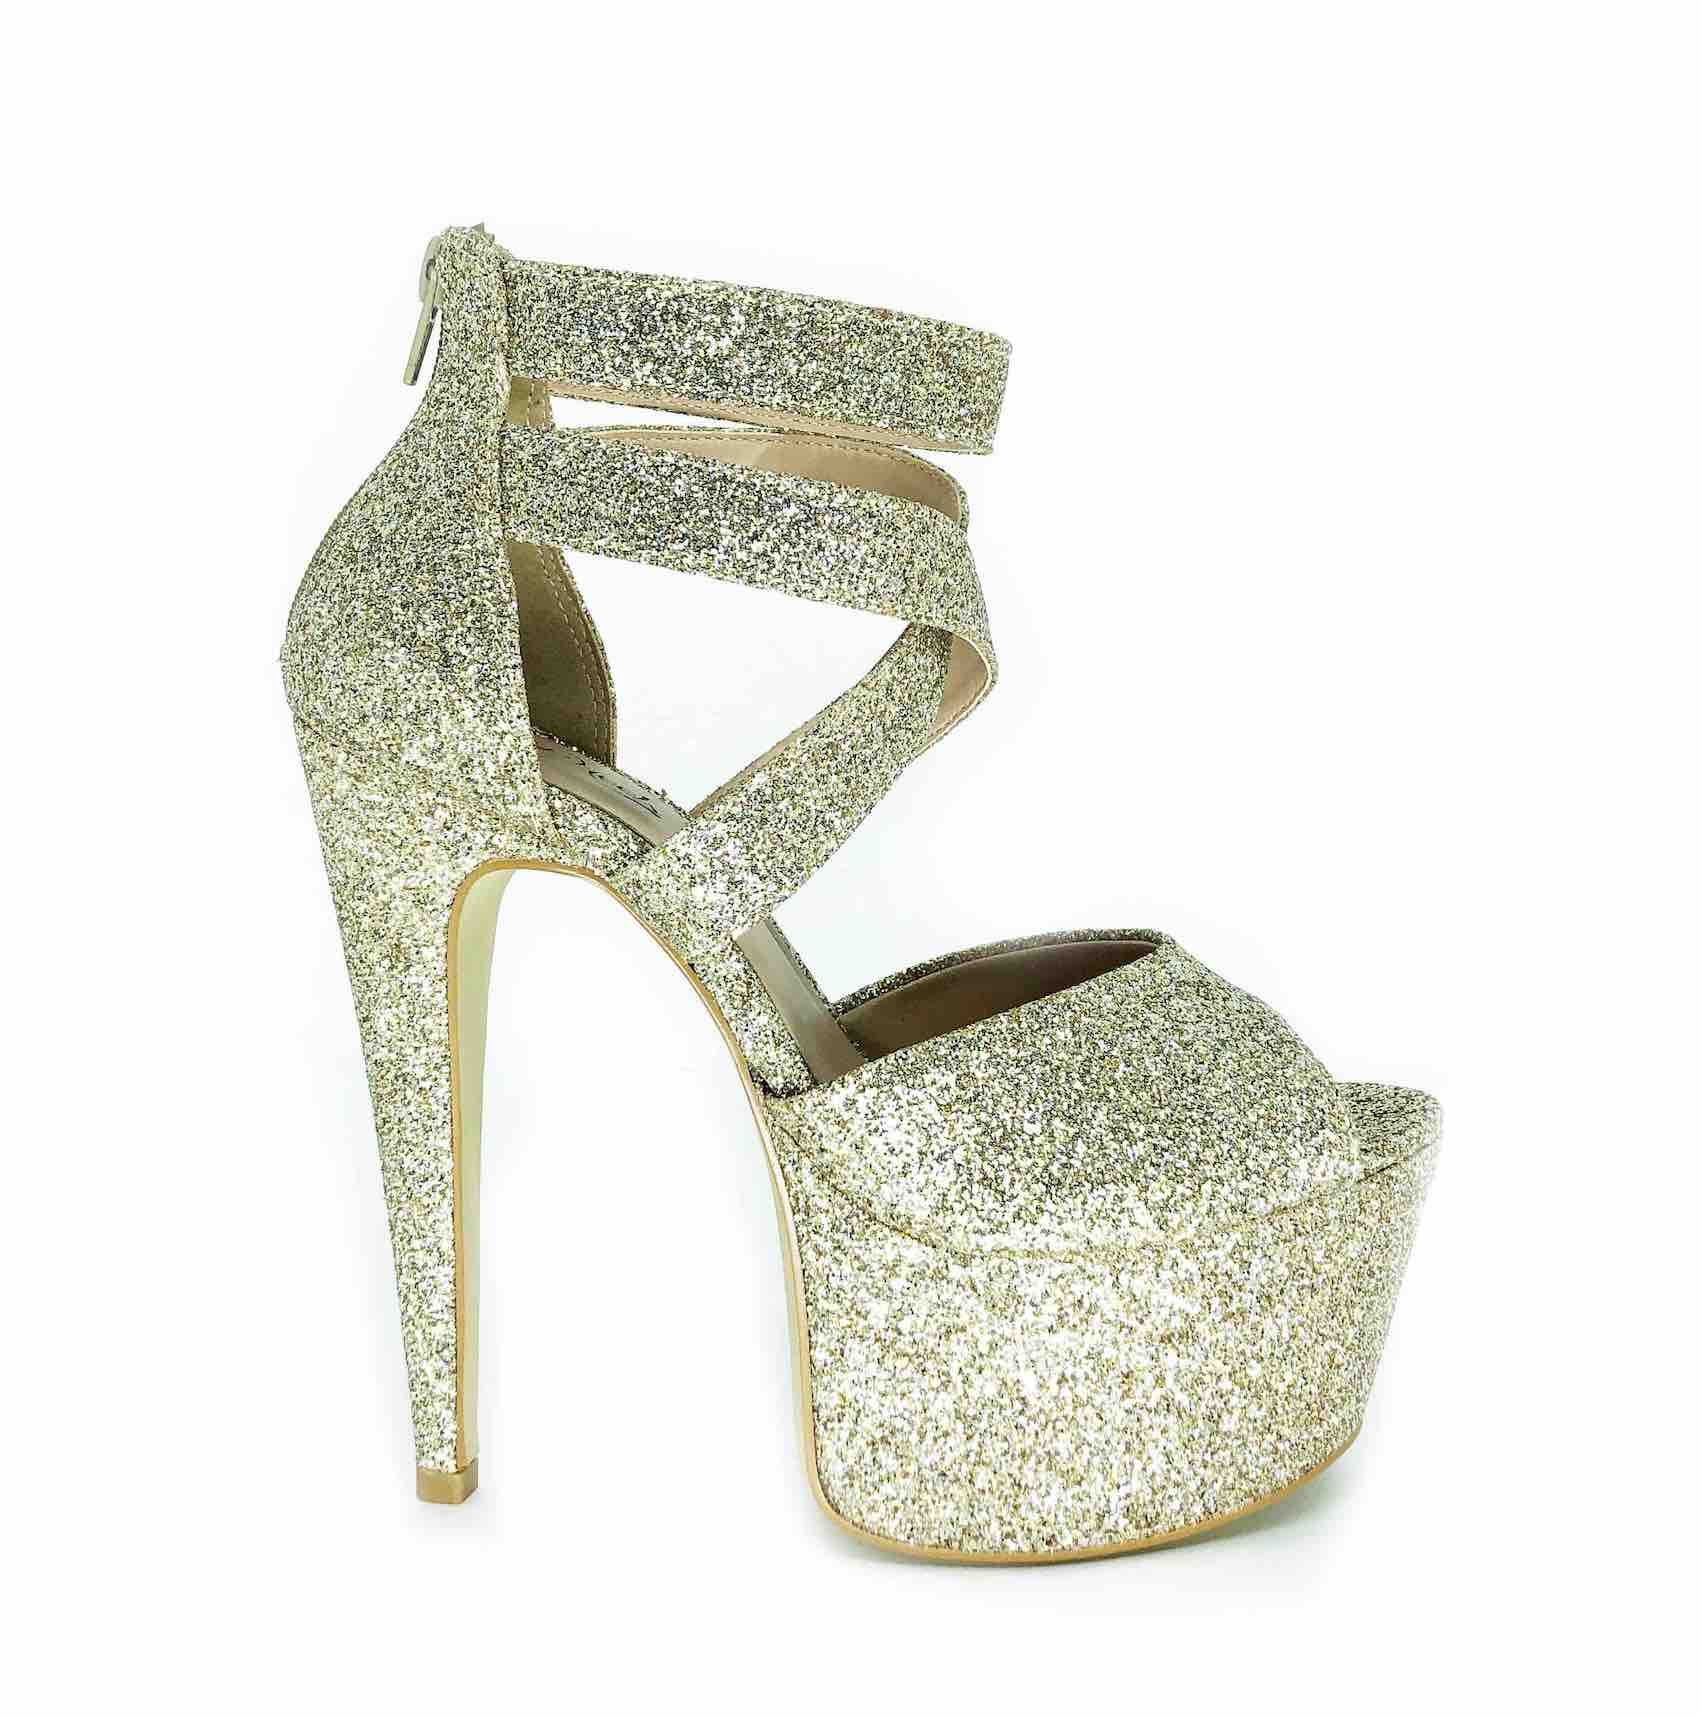 Sandália Diva Glitter Dourado NR 8US - Play Heels (pronta entrega)